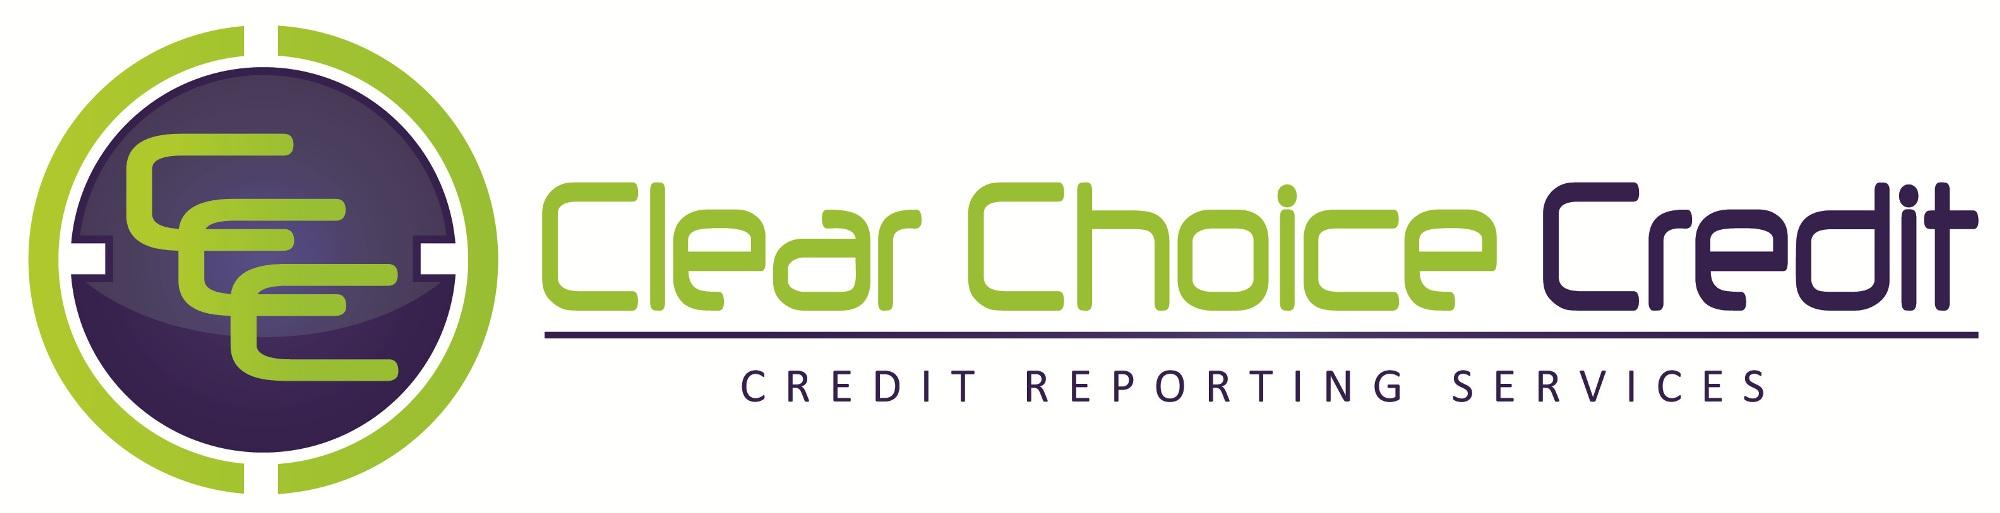 Clear Choice Credit